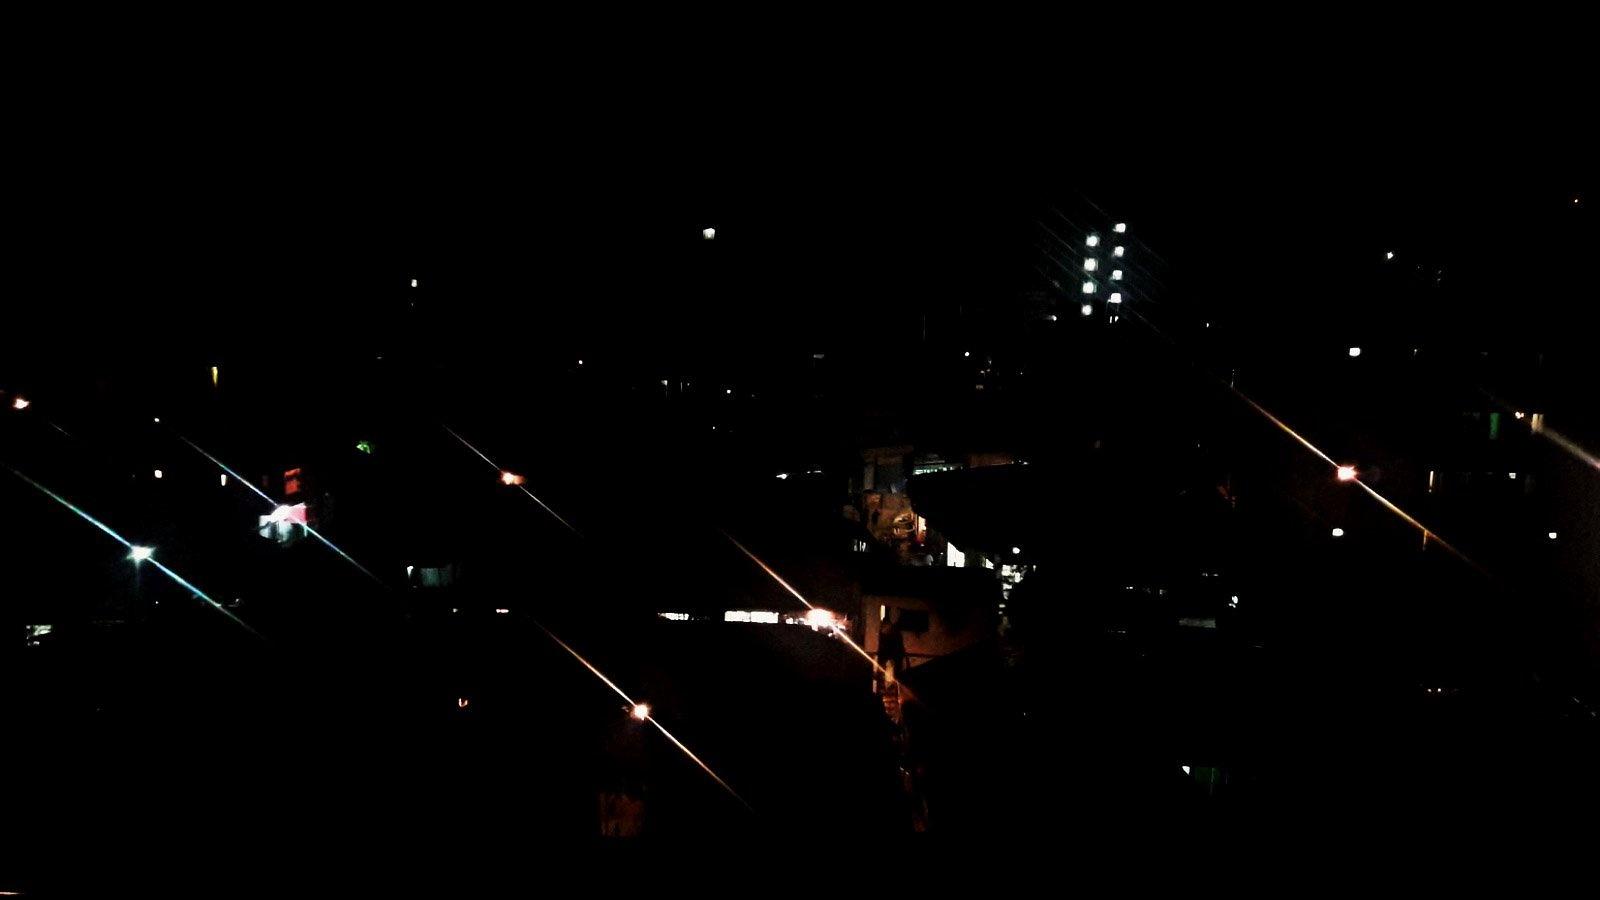 lighting by hossainsumon